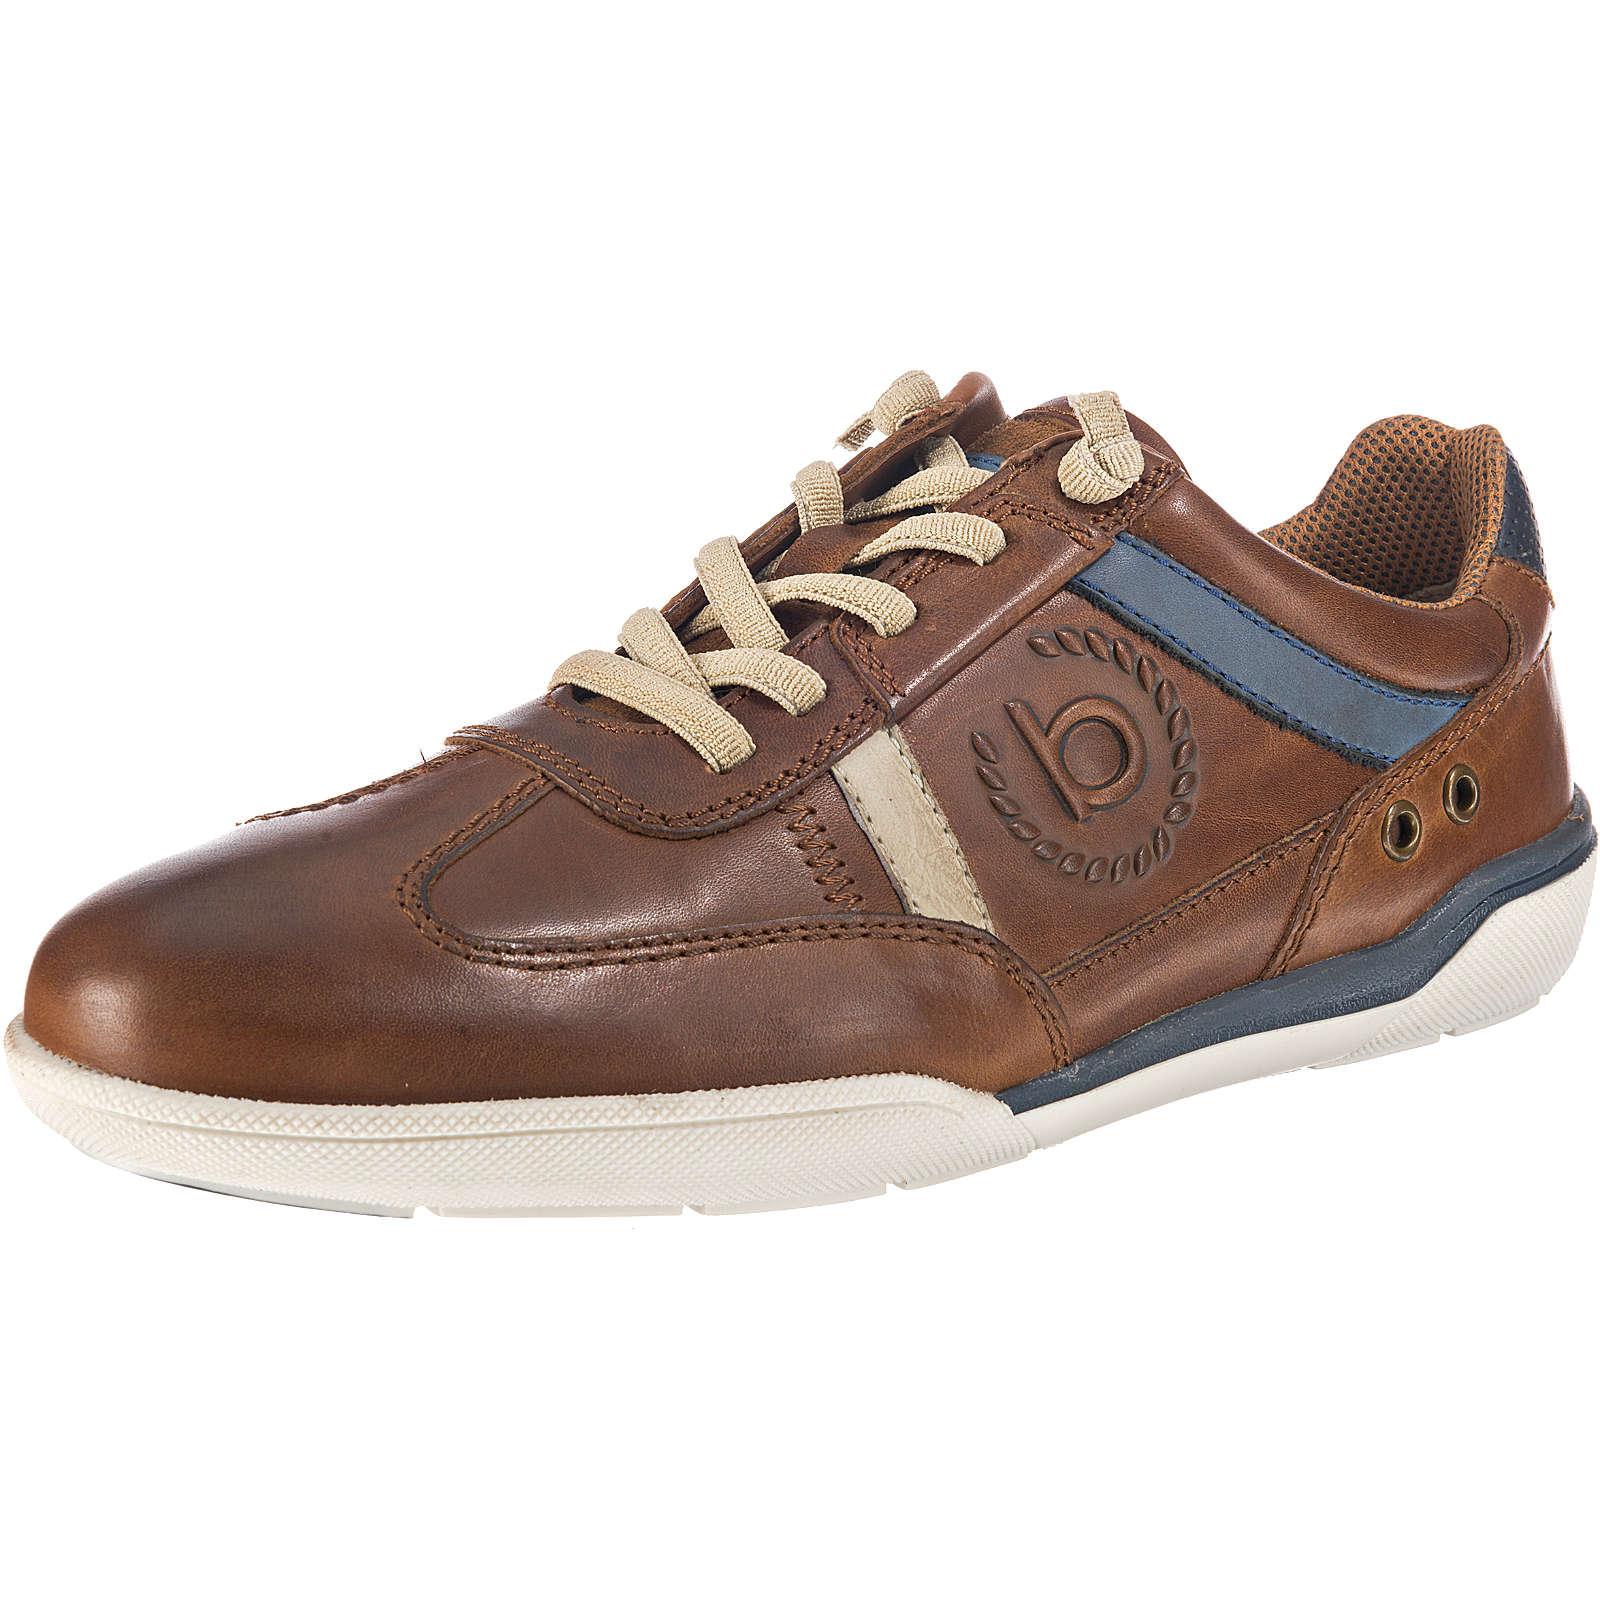 bugatti Sneakers Low cognac Herren Gr. 40